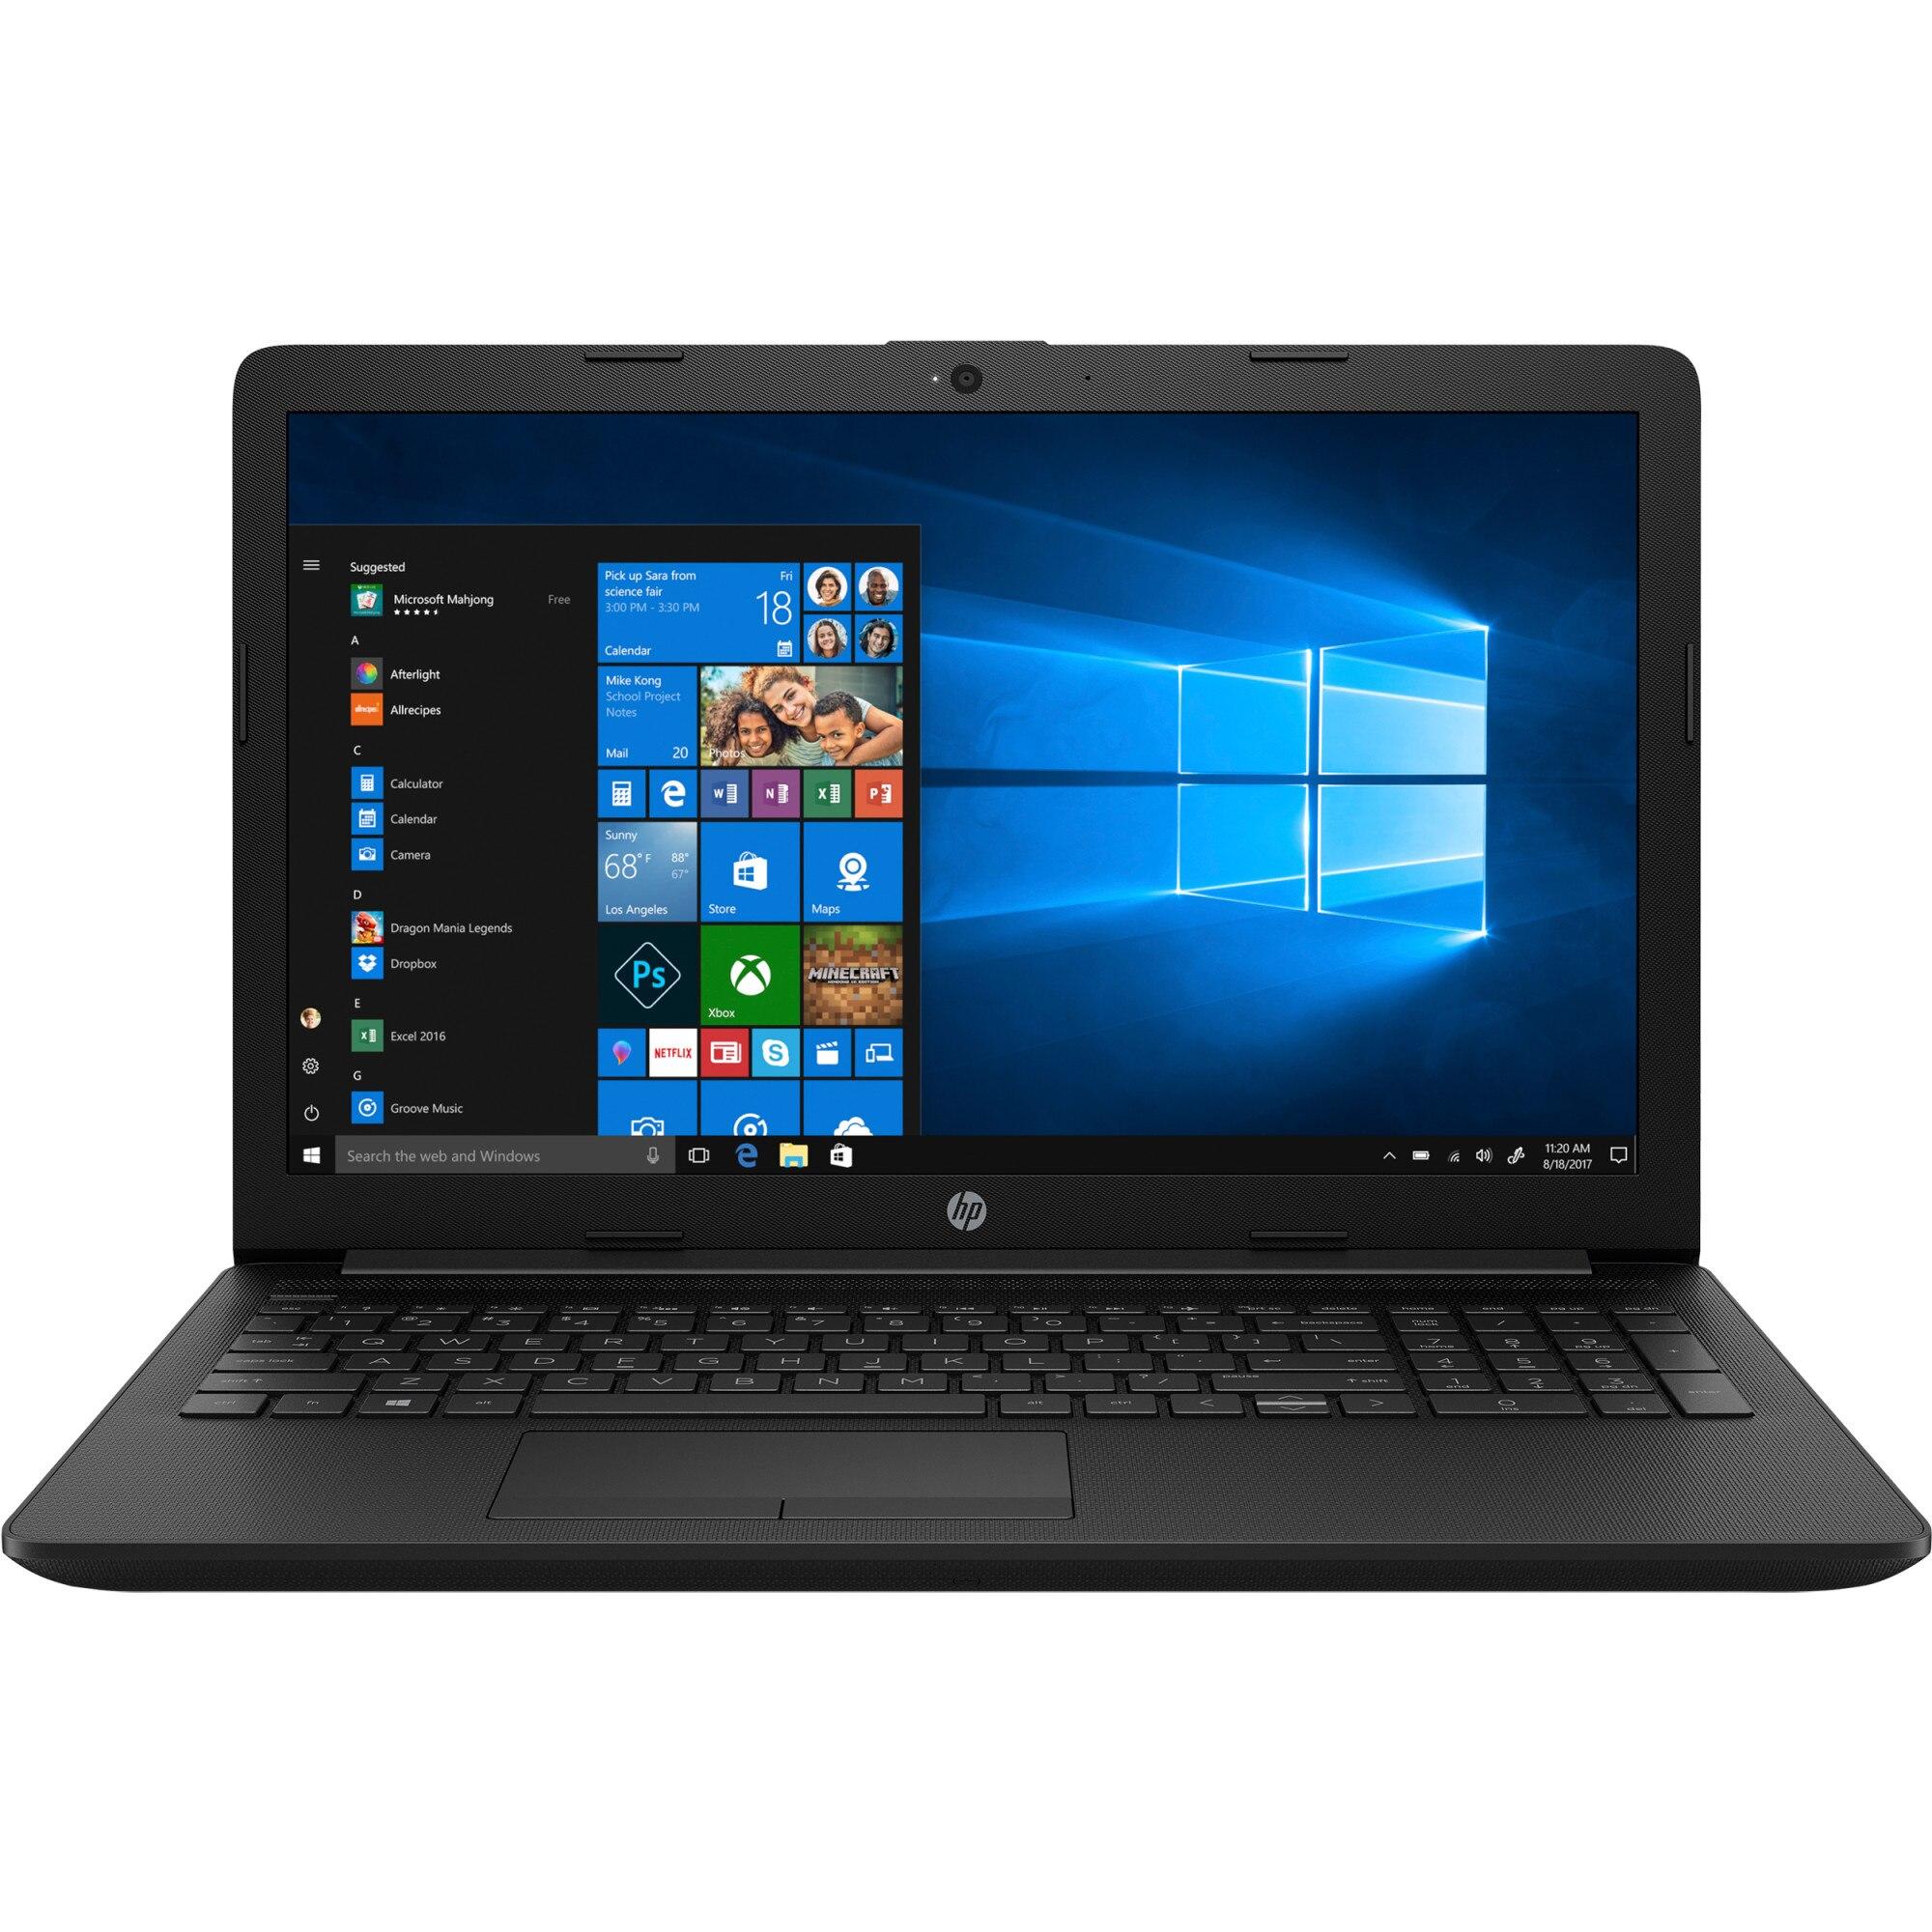 "Fotografie Laptop HP 15-da0182nq cu procesor Intel® Celeron® N4000 pana la 2.60 GHz, 15.6"", 4GB, 500GB, Intel® UHD Graphics 600, Microsoft Windows 10, Black"